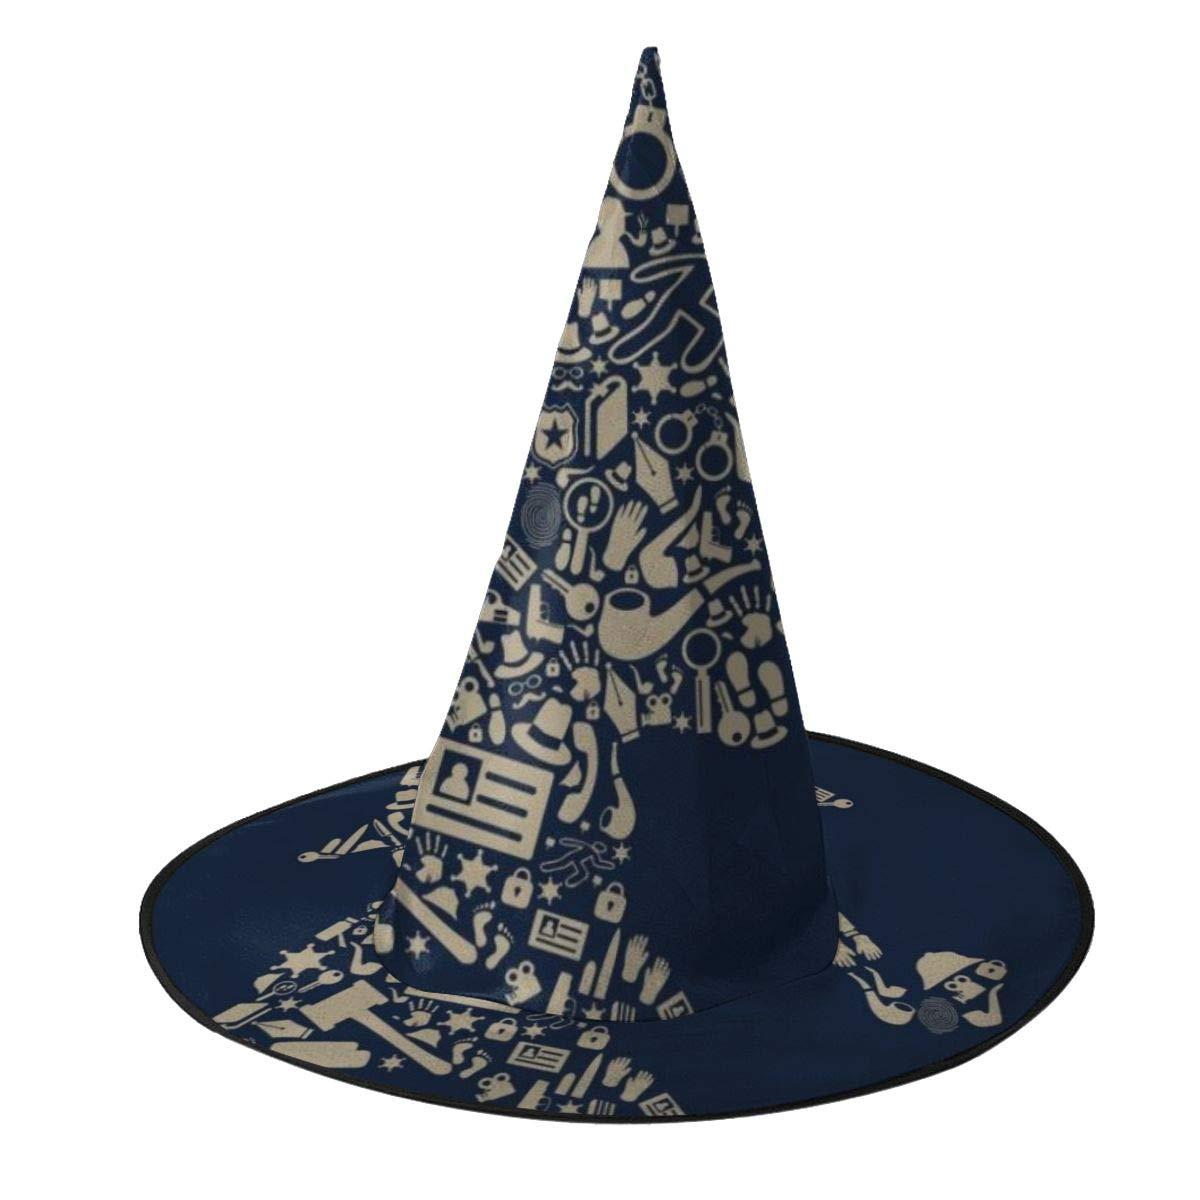 NUJSHF Sherlock Holmes Collage Sombrero de Bruja Halloween Unisex ...